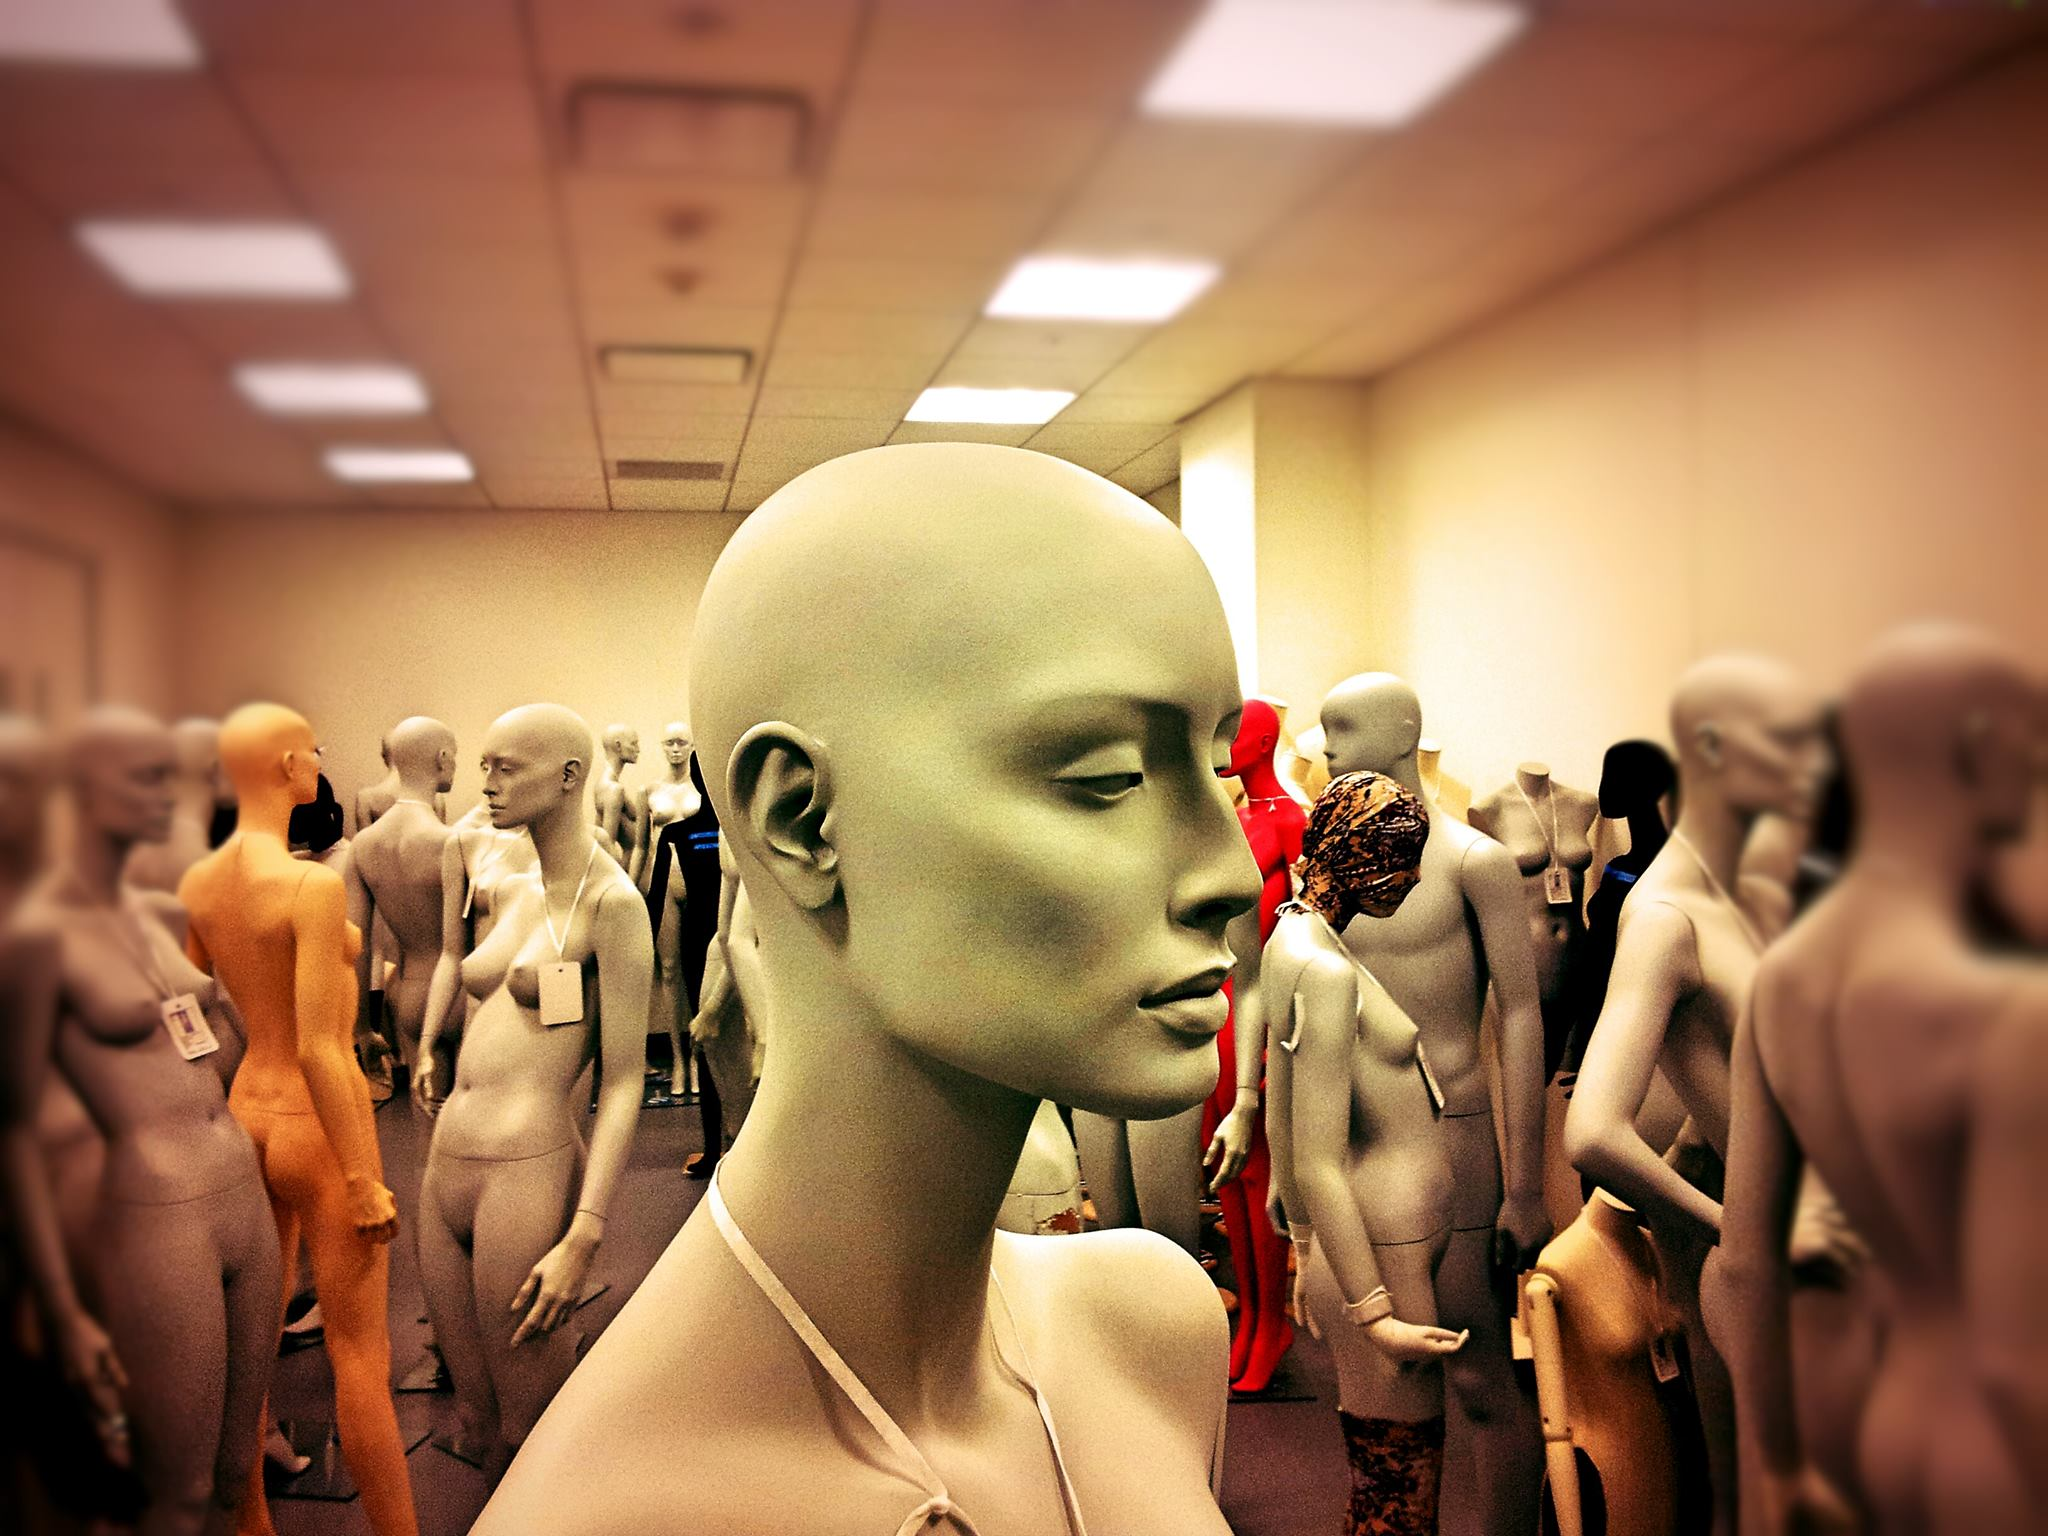 "Mannequins waiting for the PEM Avant-Garde Japanese Fashion exhibit via <a href=""https://www.facebook.com/photo.php?fbid=617582954949742&amp;set=pb.205951626112879.-2207520000.1384205665.&amp;type=3&amp;theater"">Facebook</a>"